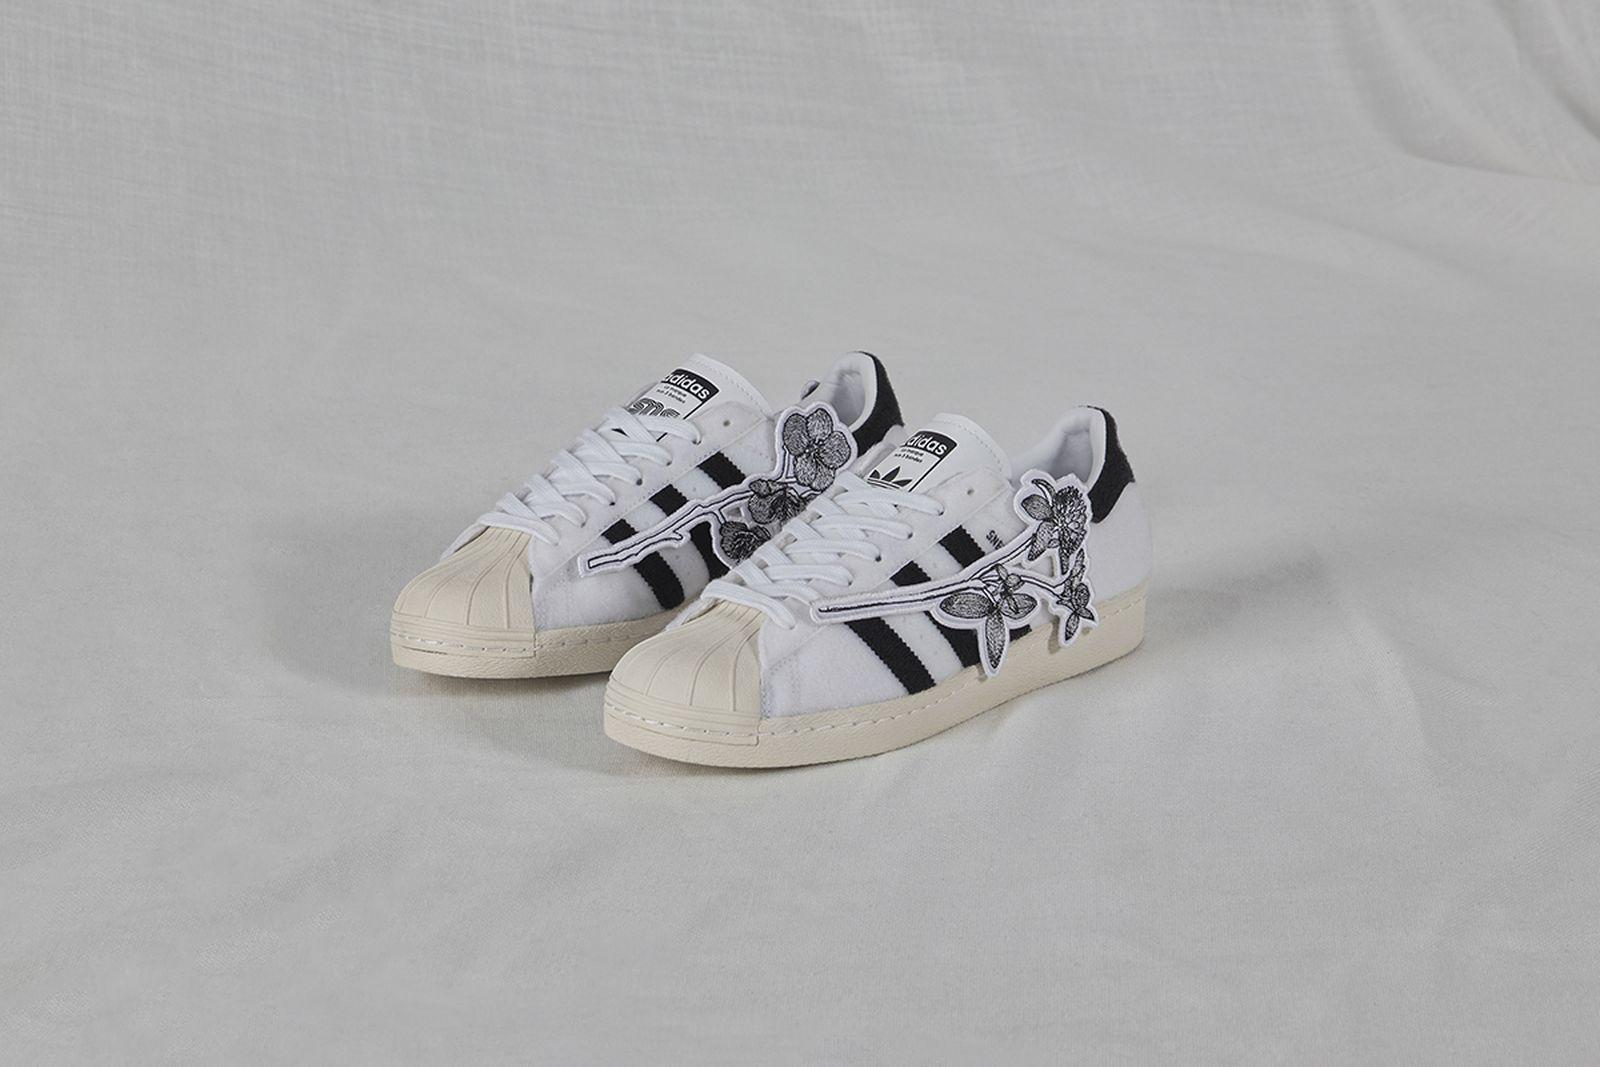 sns-kazuki-kuraishi-adidas-superstar-release-date-price-01